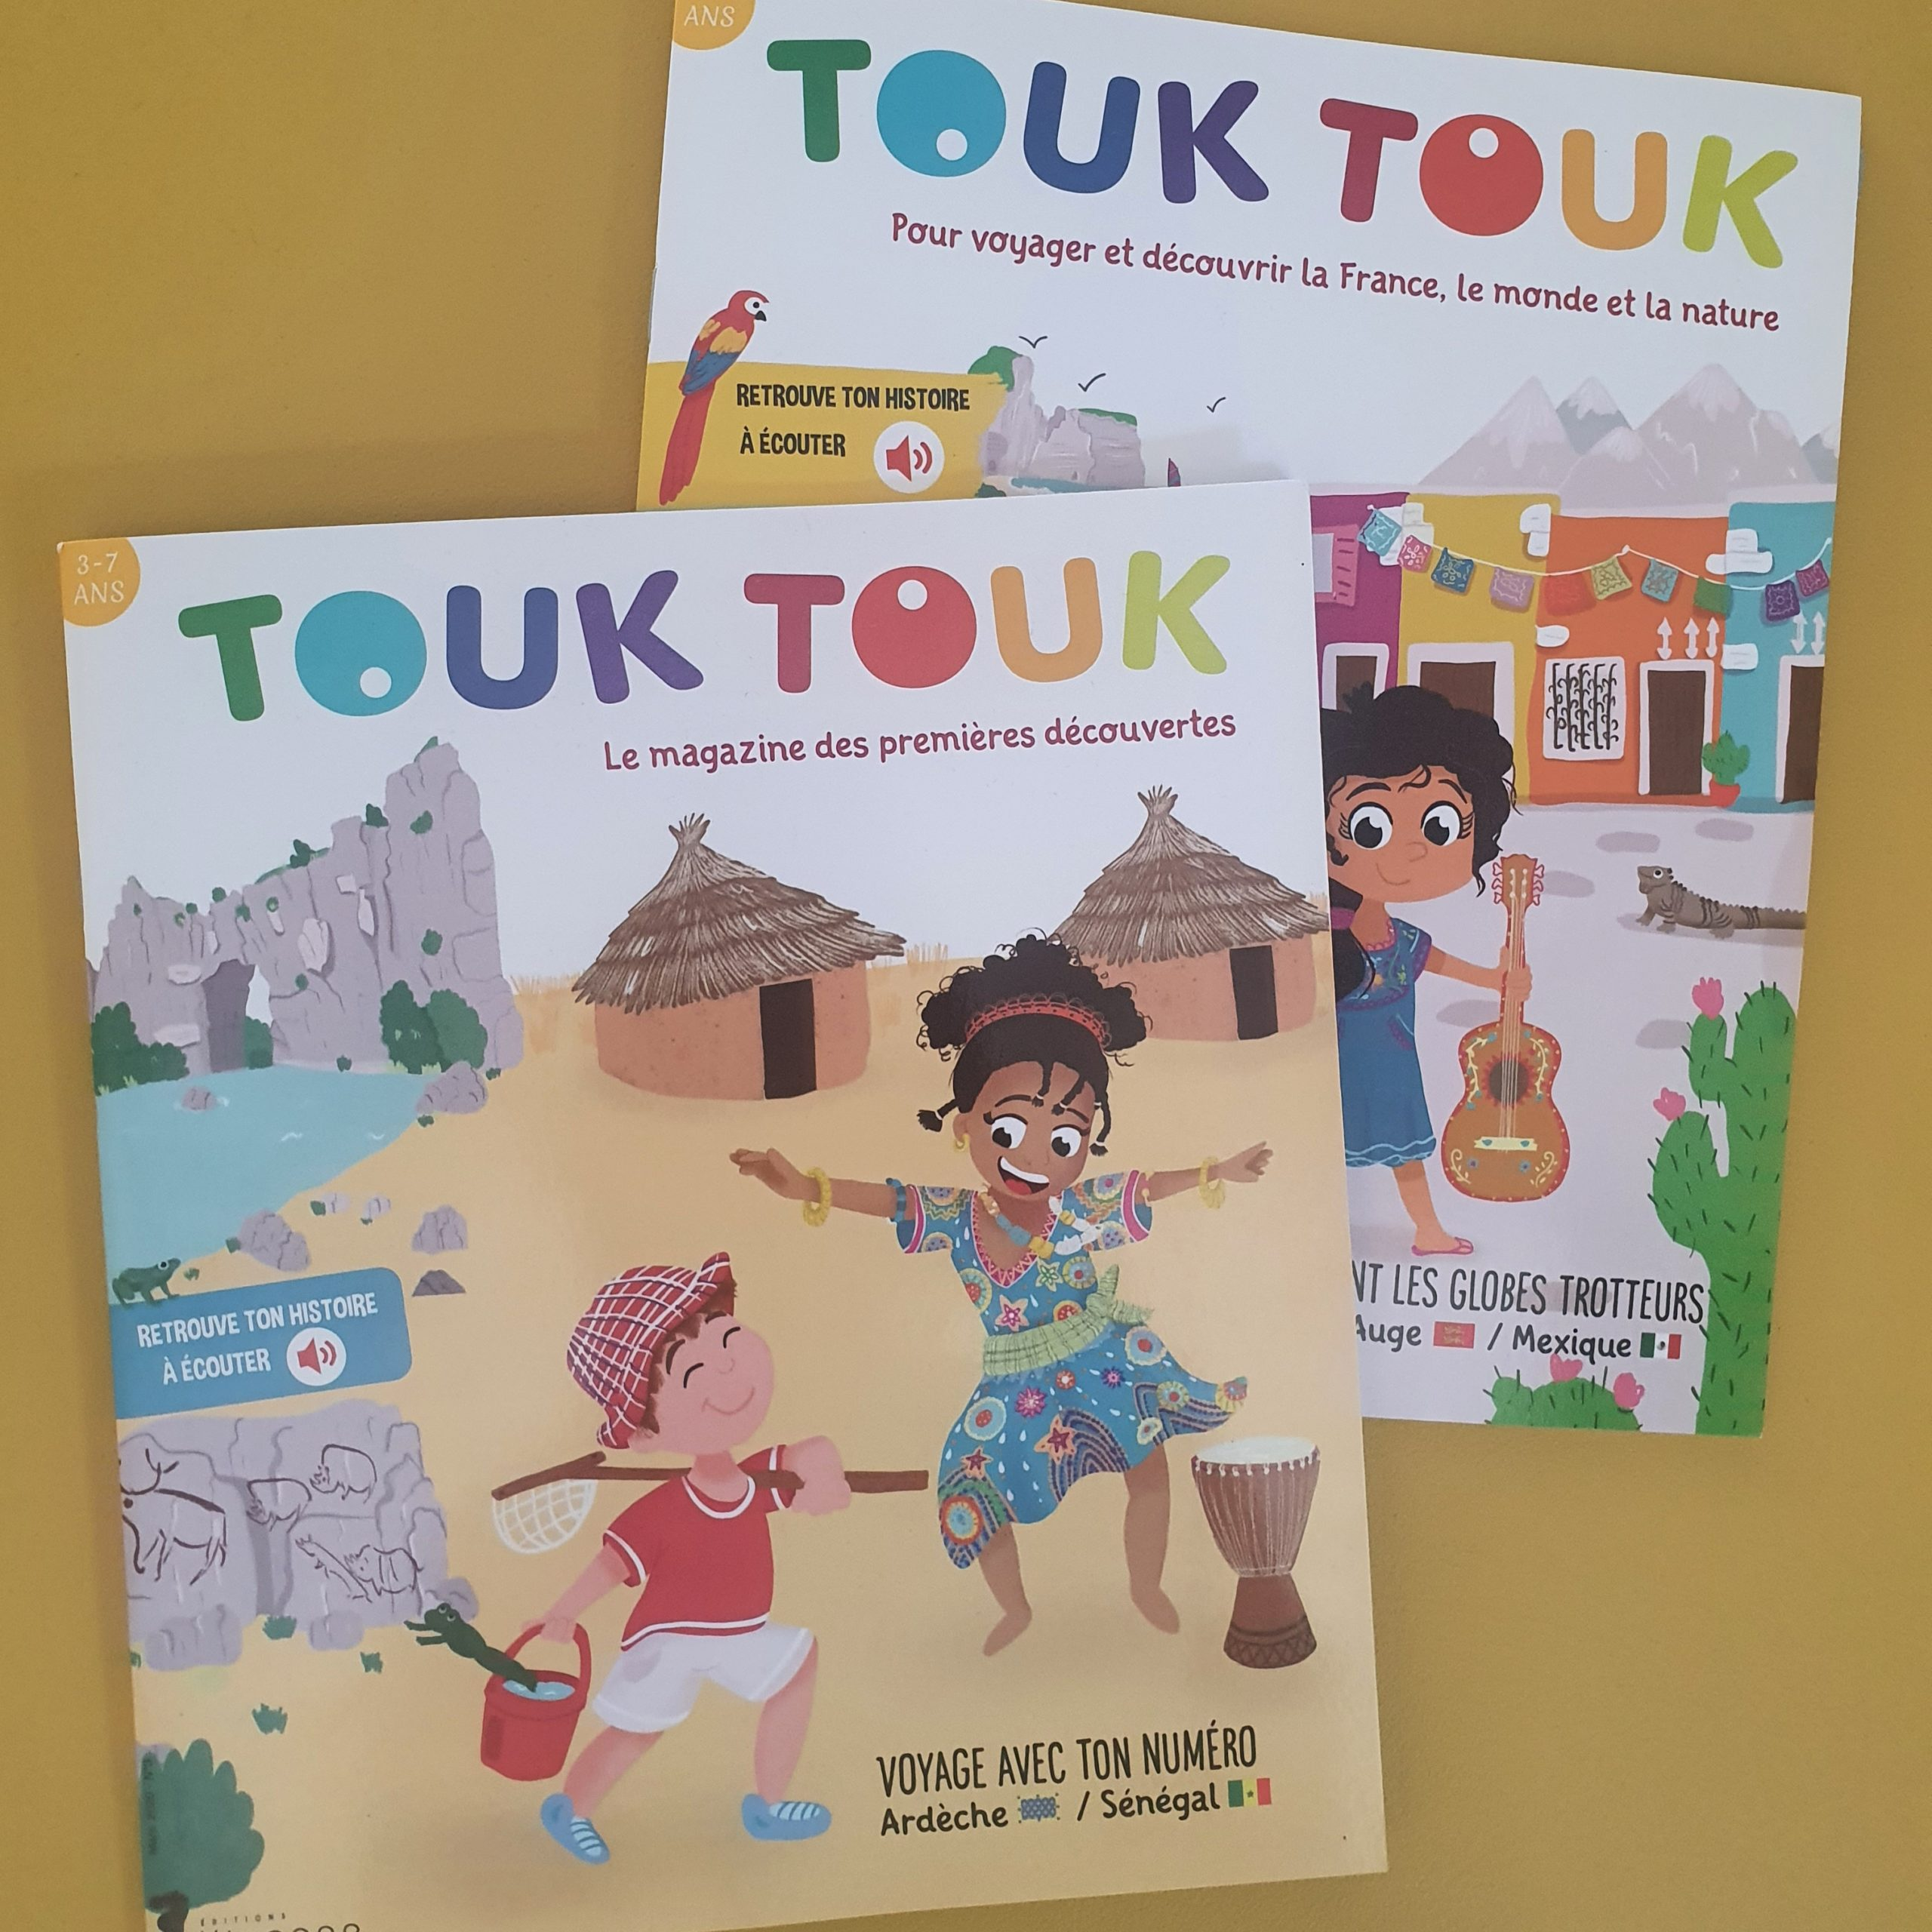 Touk touk magazine, test et avis